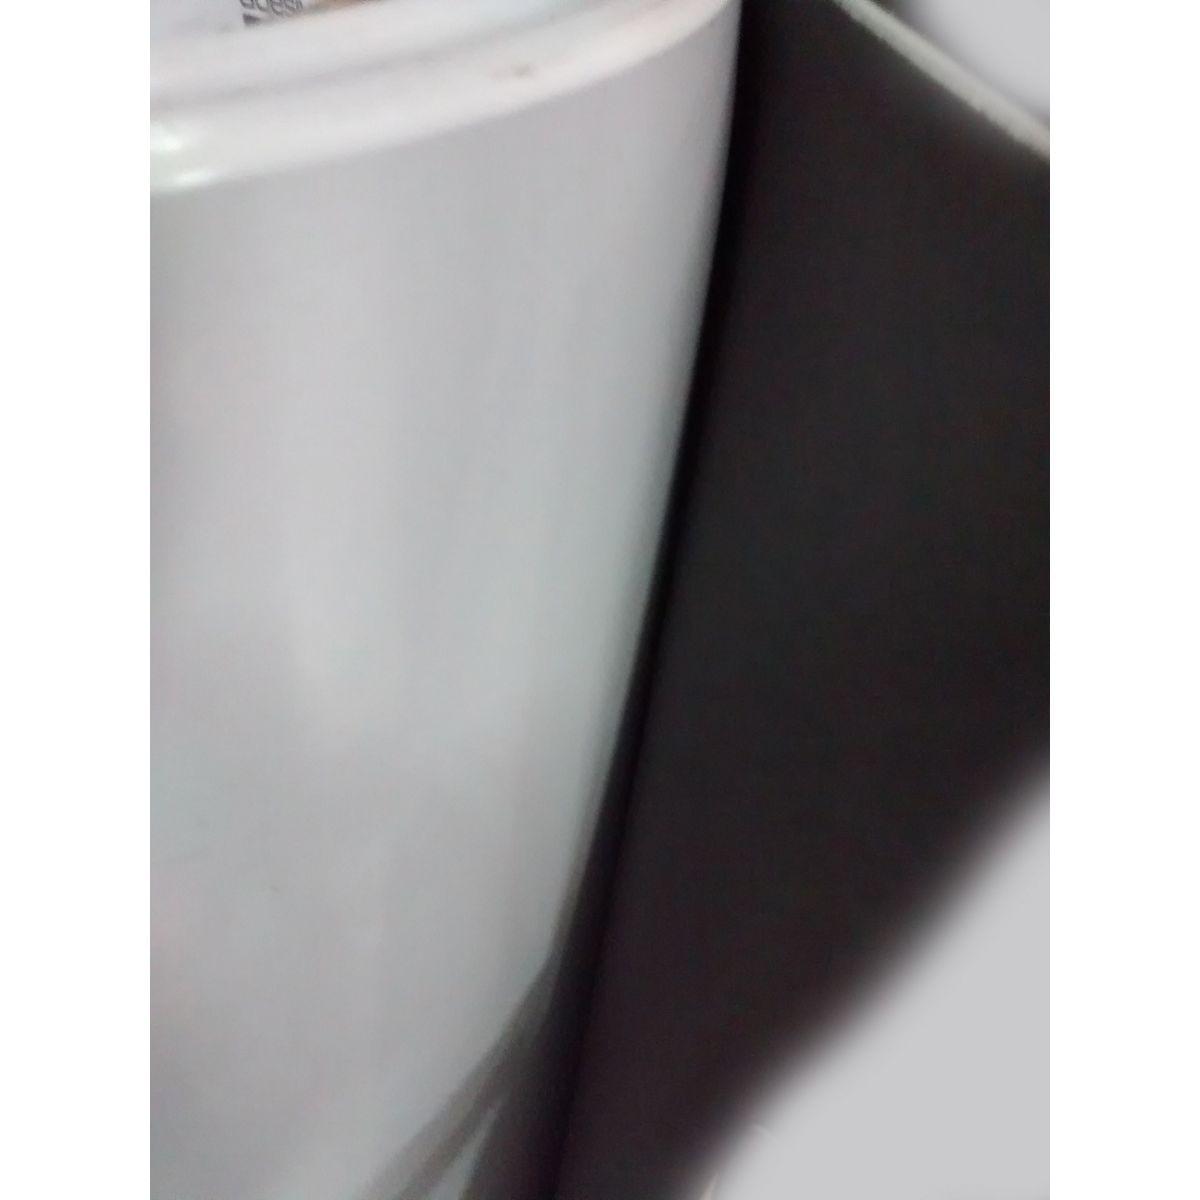 Manta Magnetica 0,3 Adesivada Largura 0,61